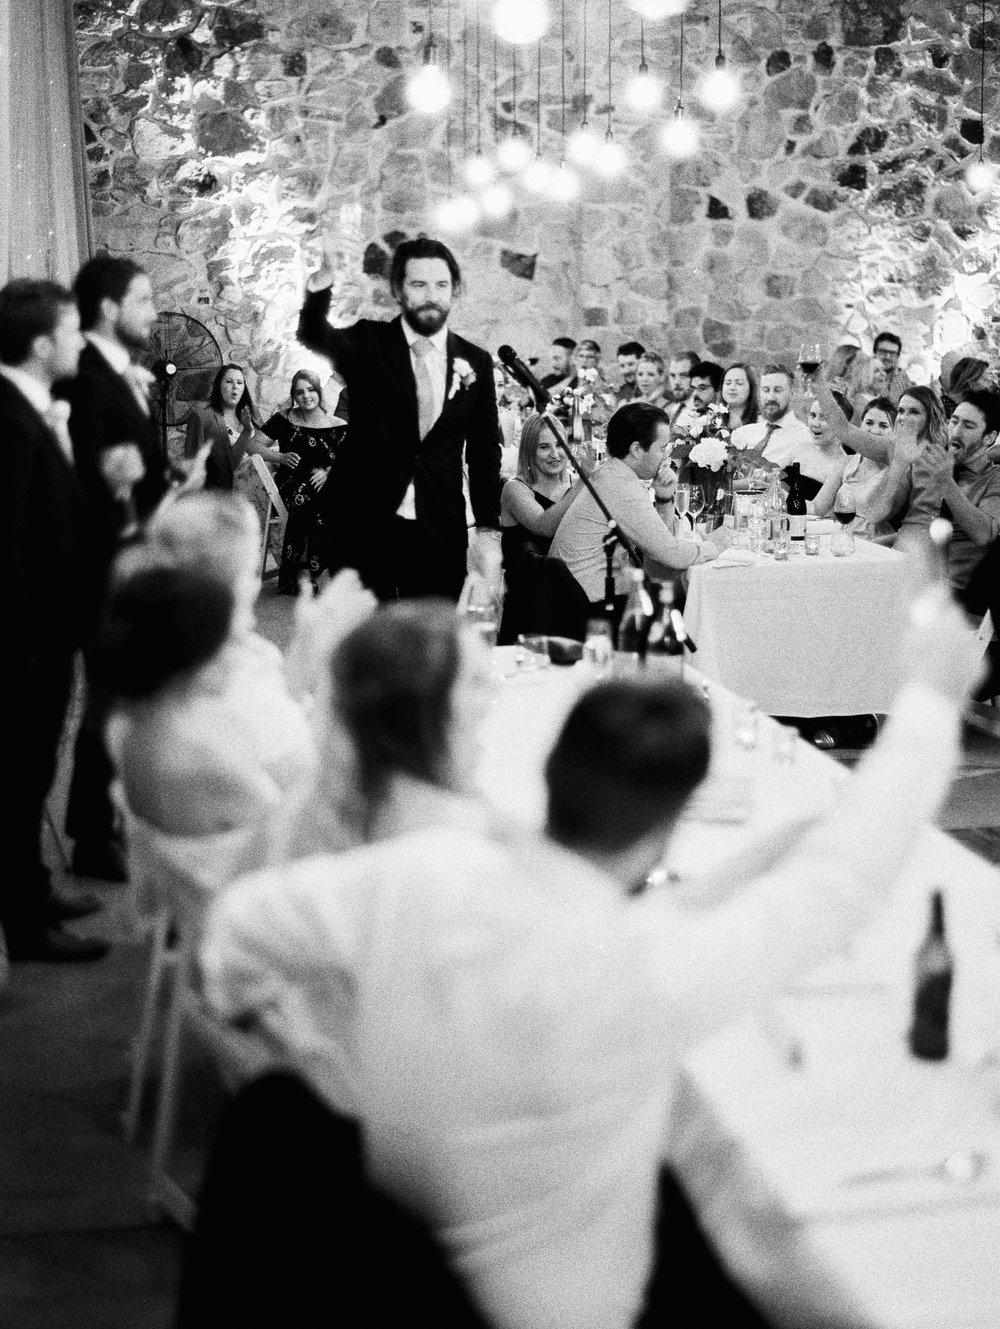 Golding-Wines-wedding-photography-120.jpg